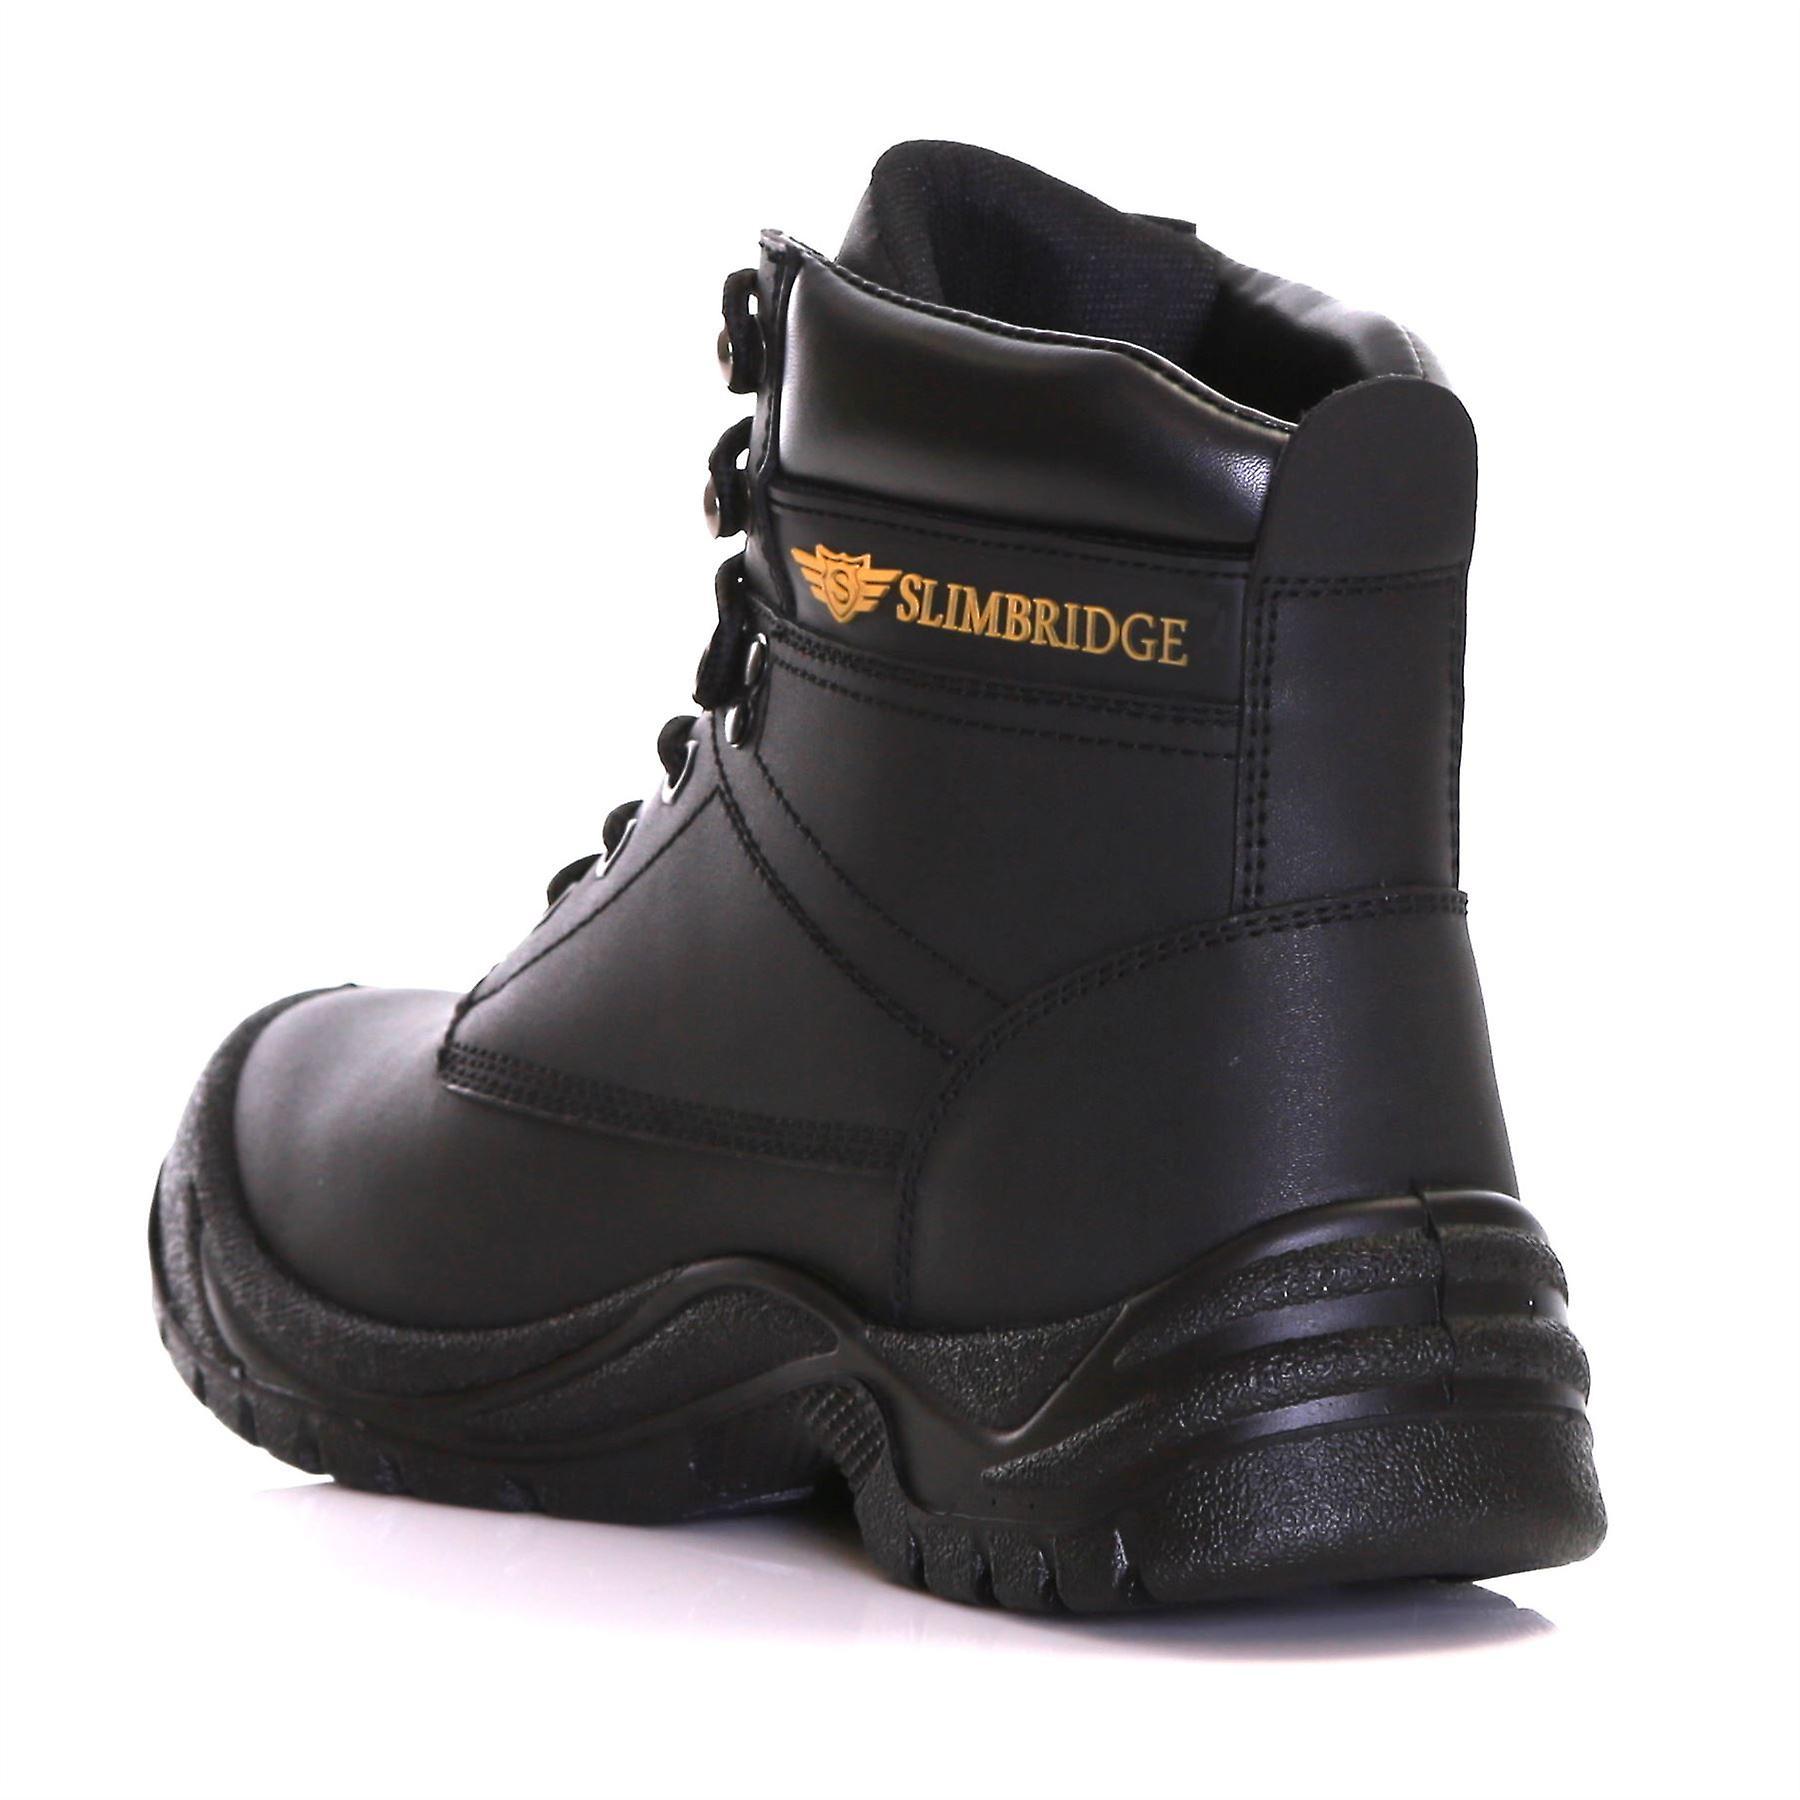 Slimbridge Velbert Size 11 Safety Boots, Black